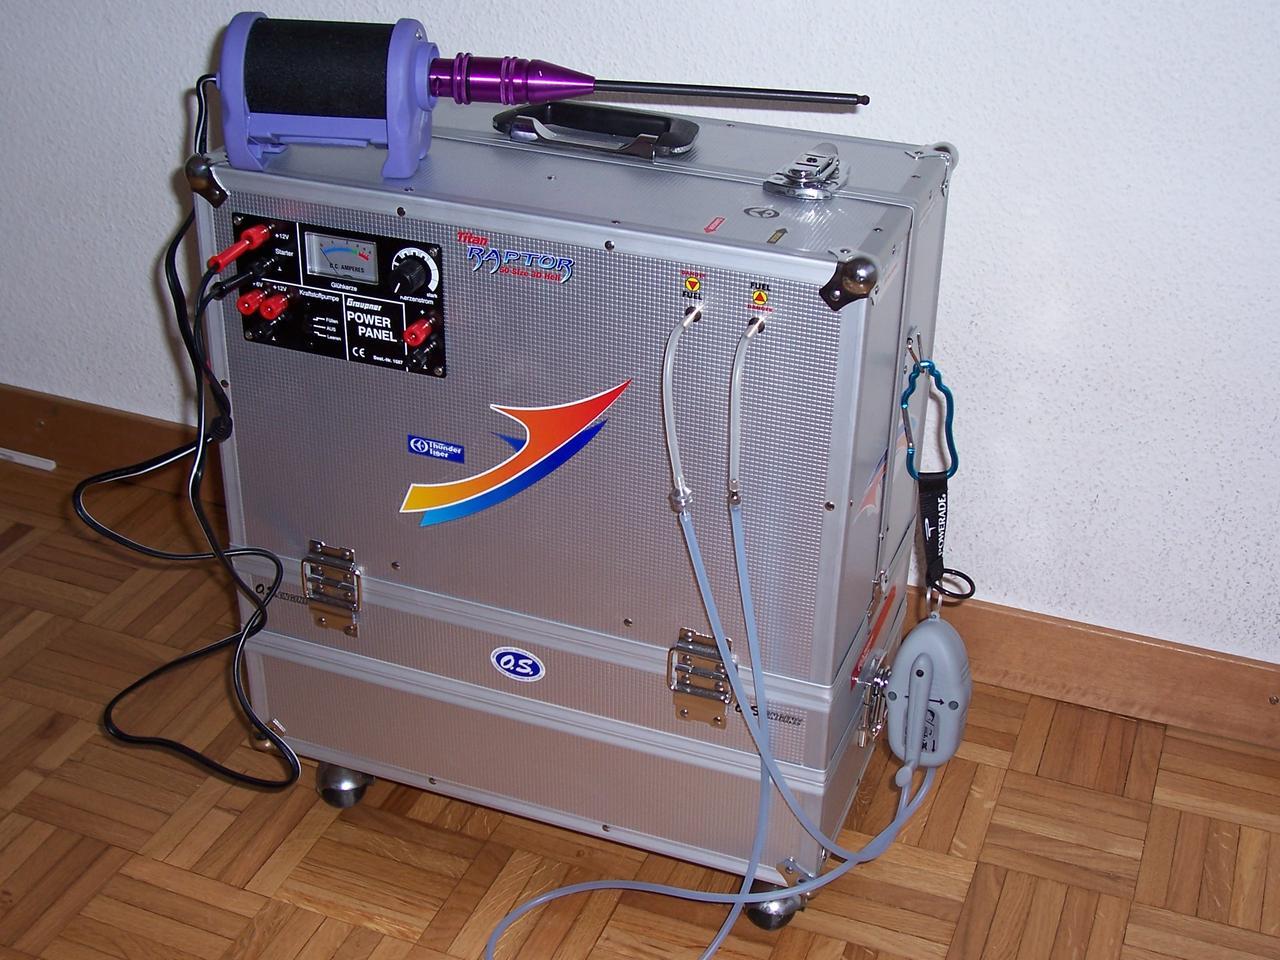 Elicottero Etimologia : Valigie o valige odor